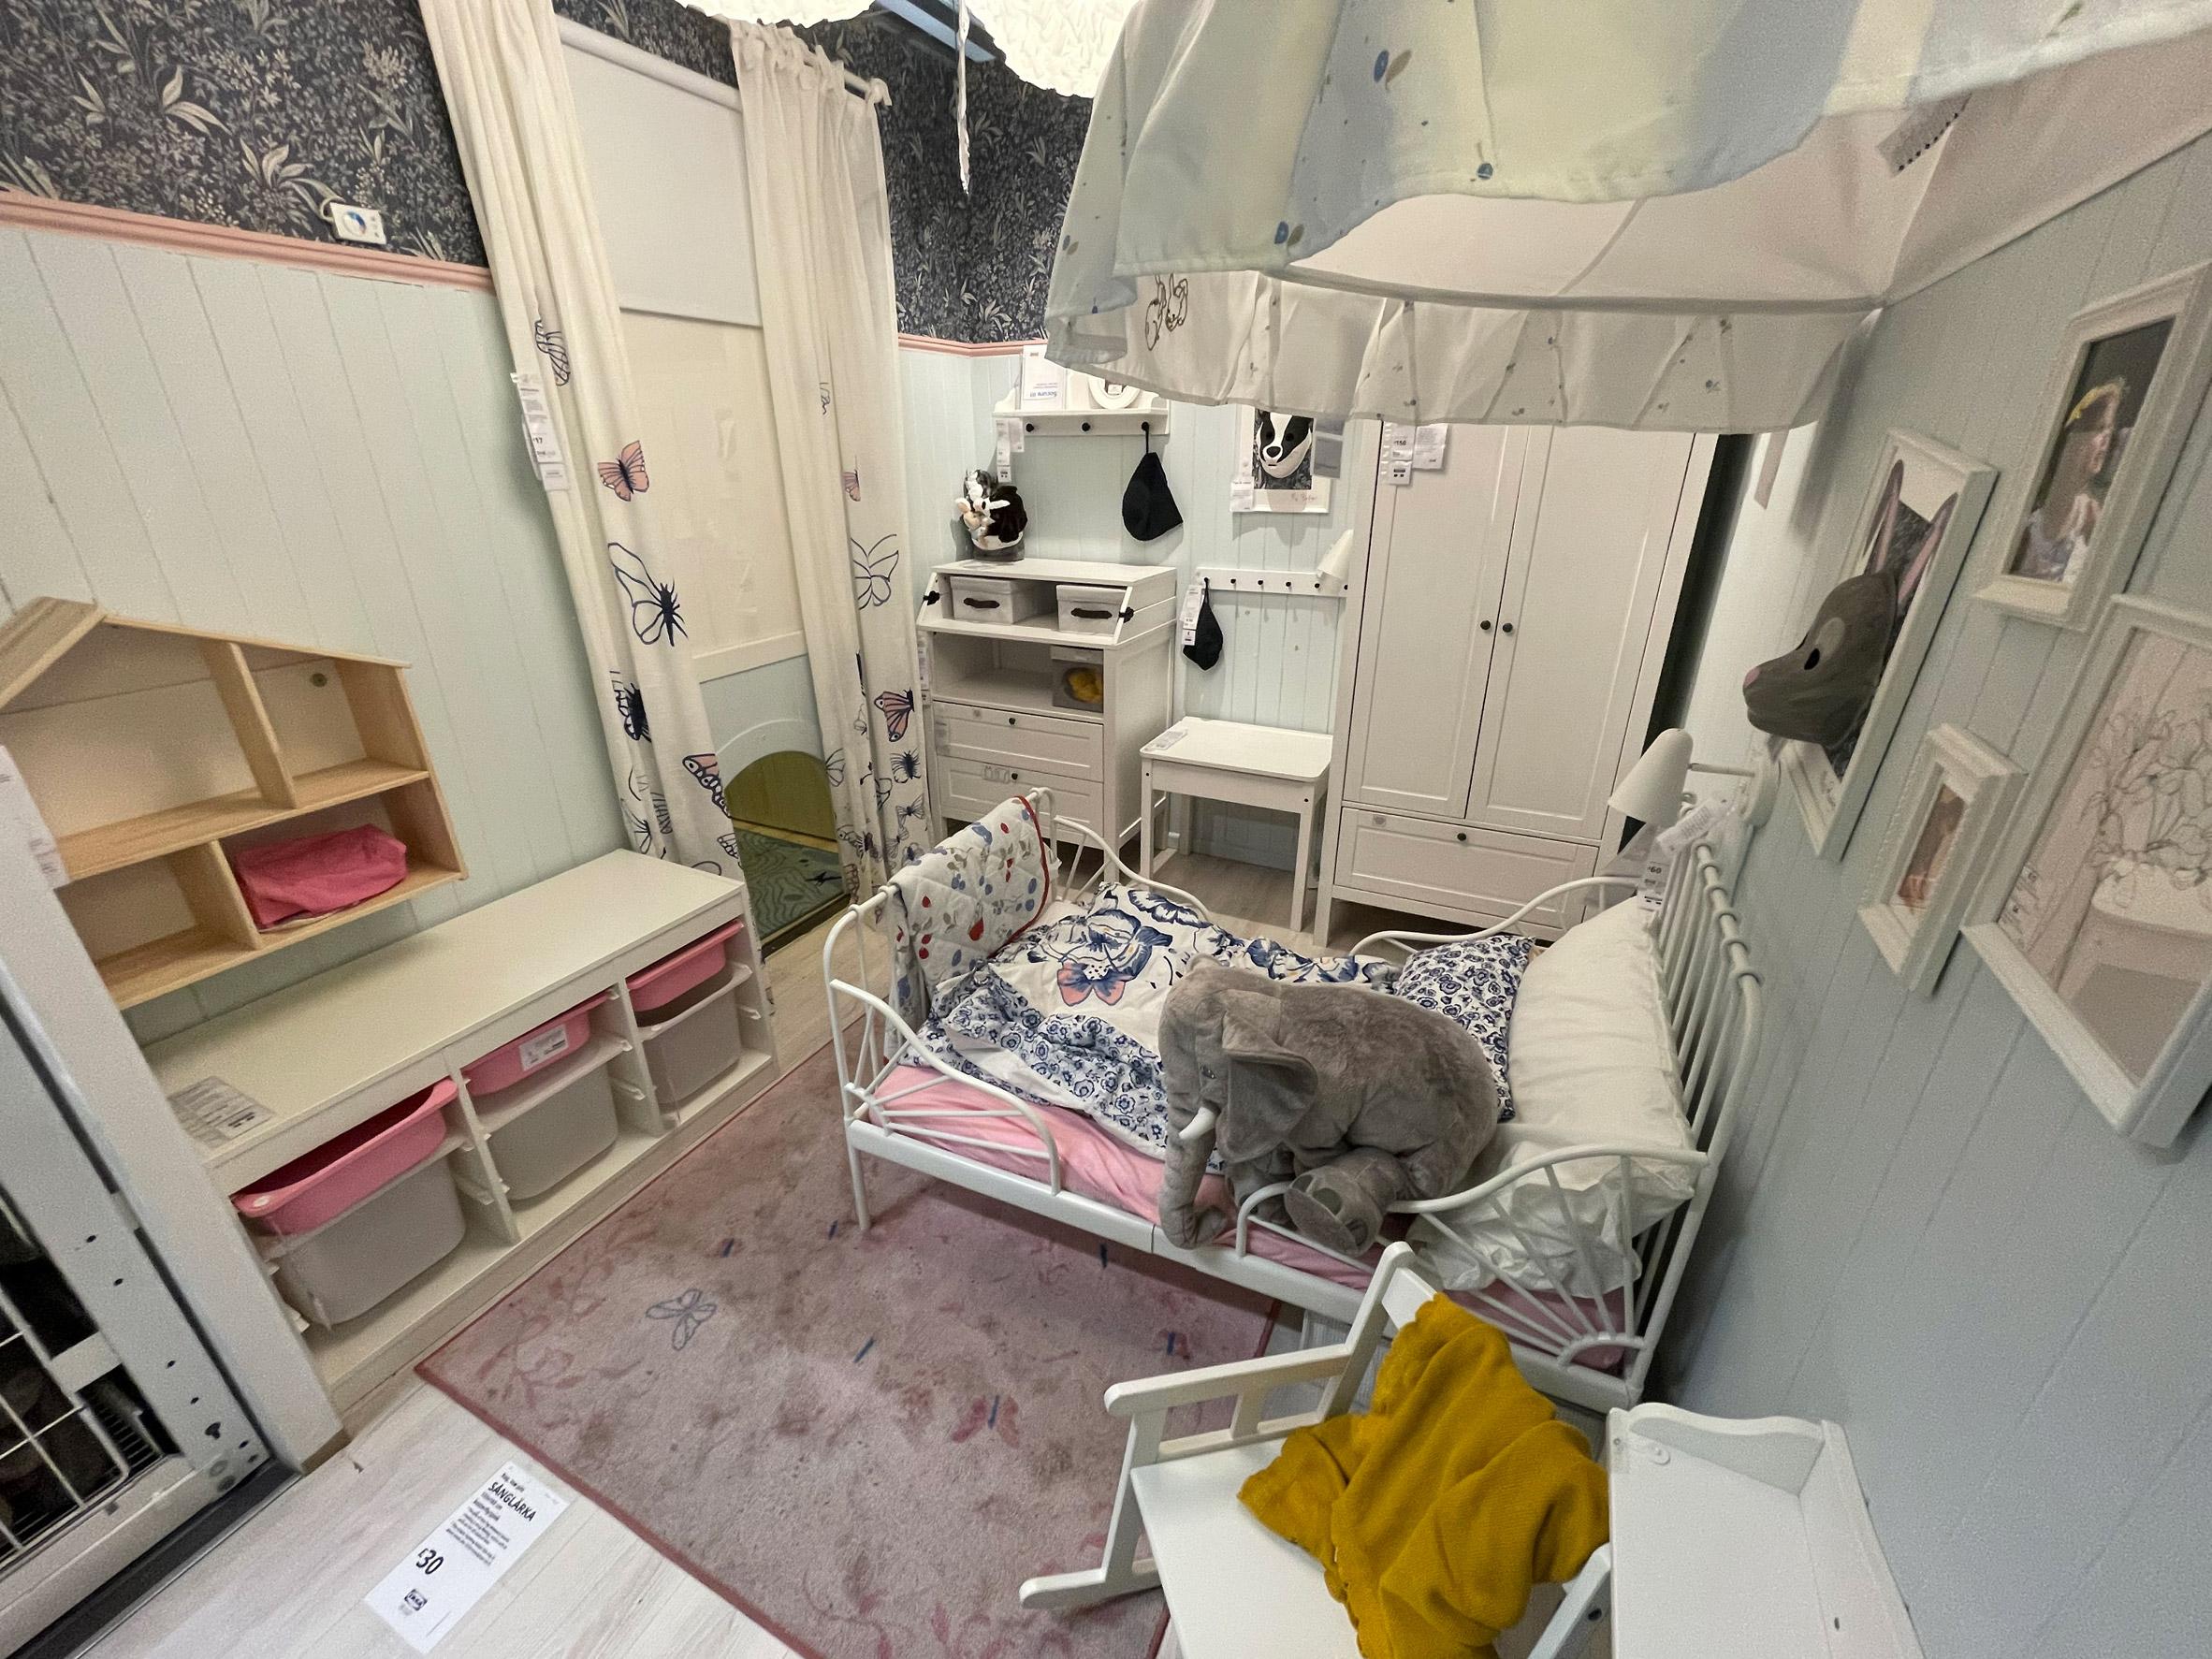 A model child's bedroom